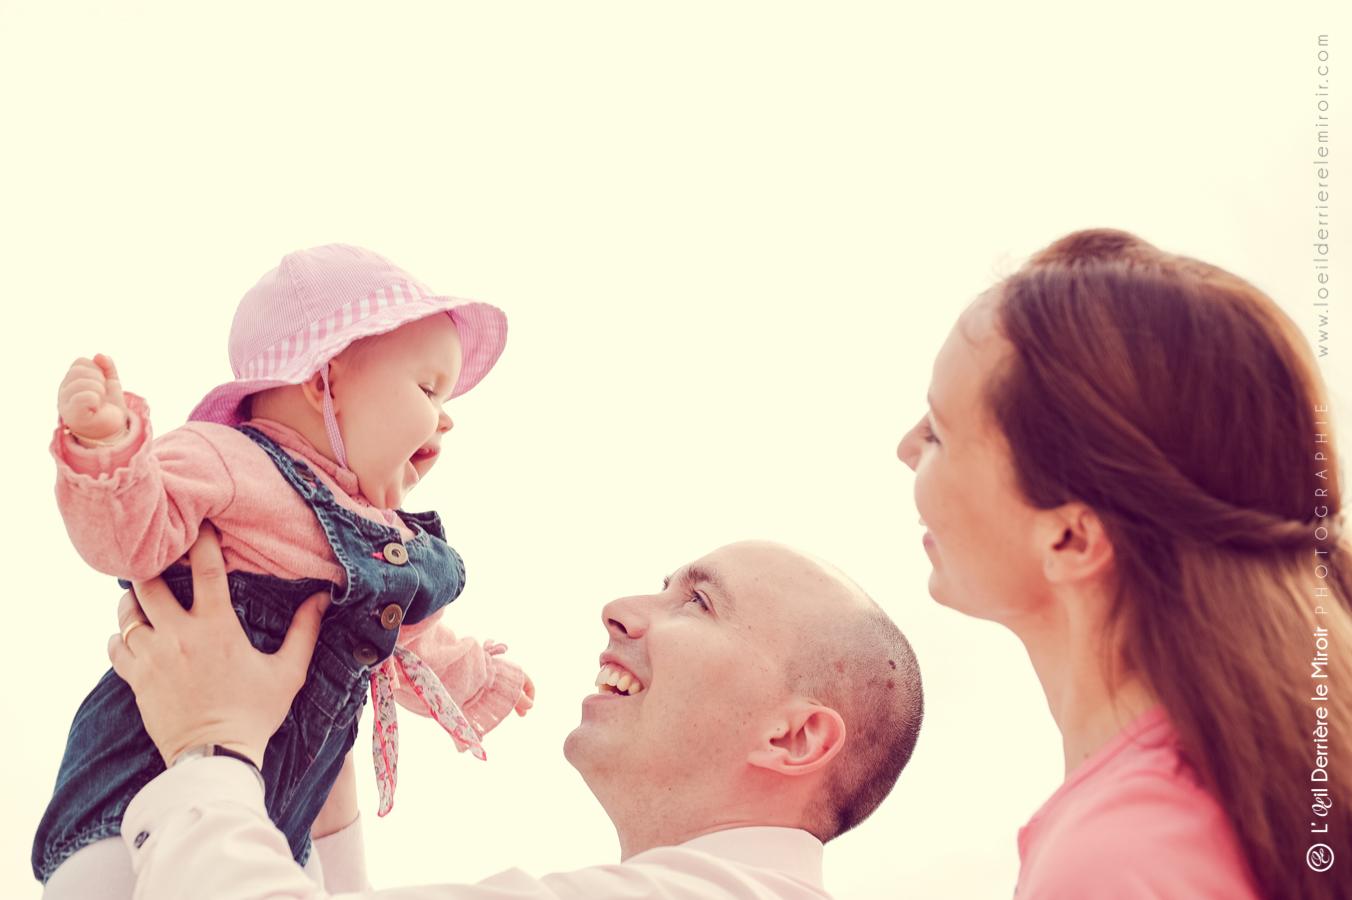 photographe-bebe-loeilderrierelemiroir-020